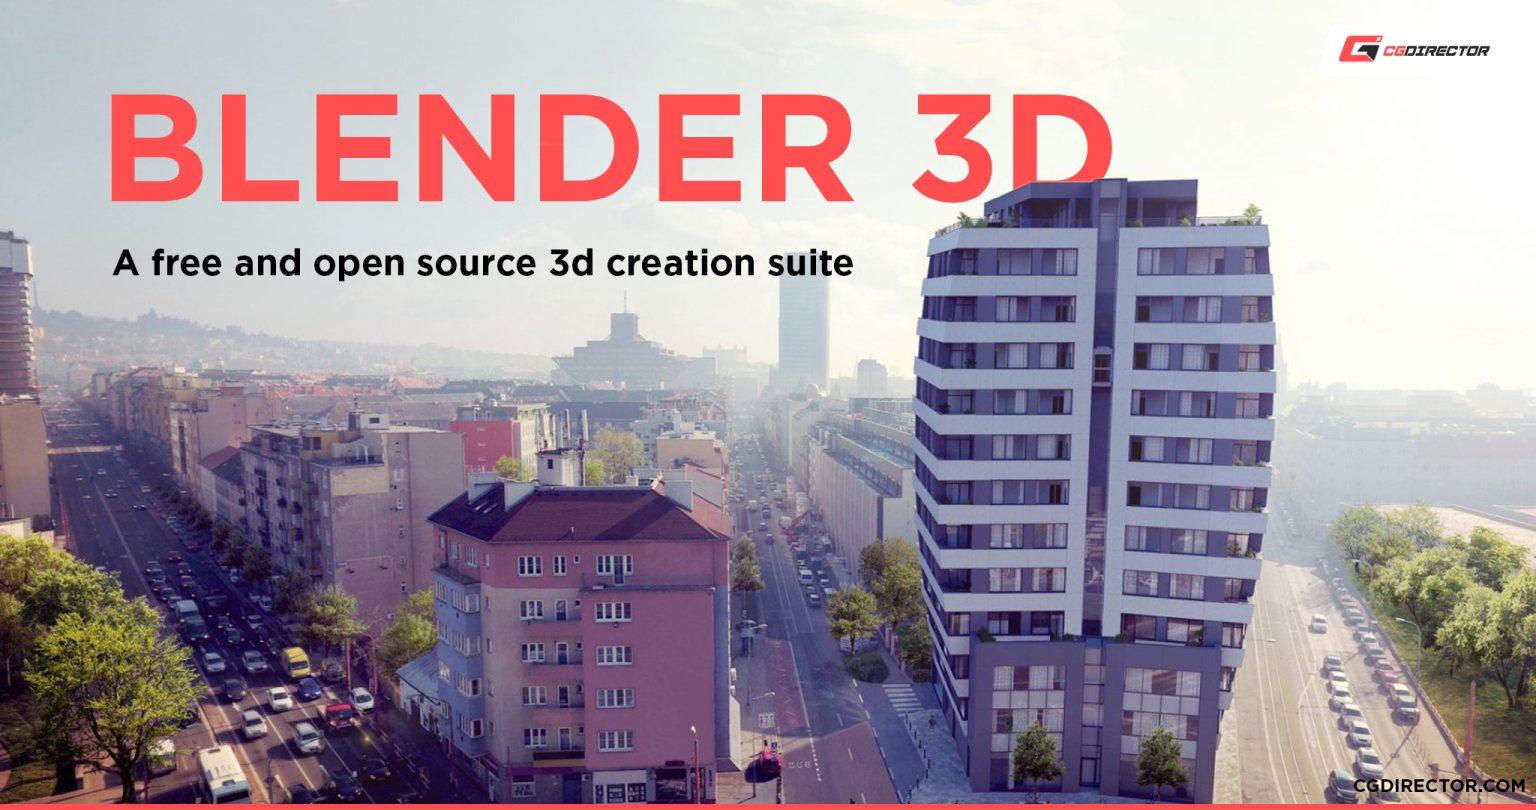 Blender Software for Animation Students